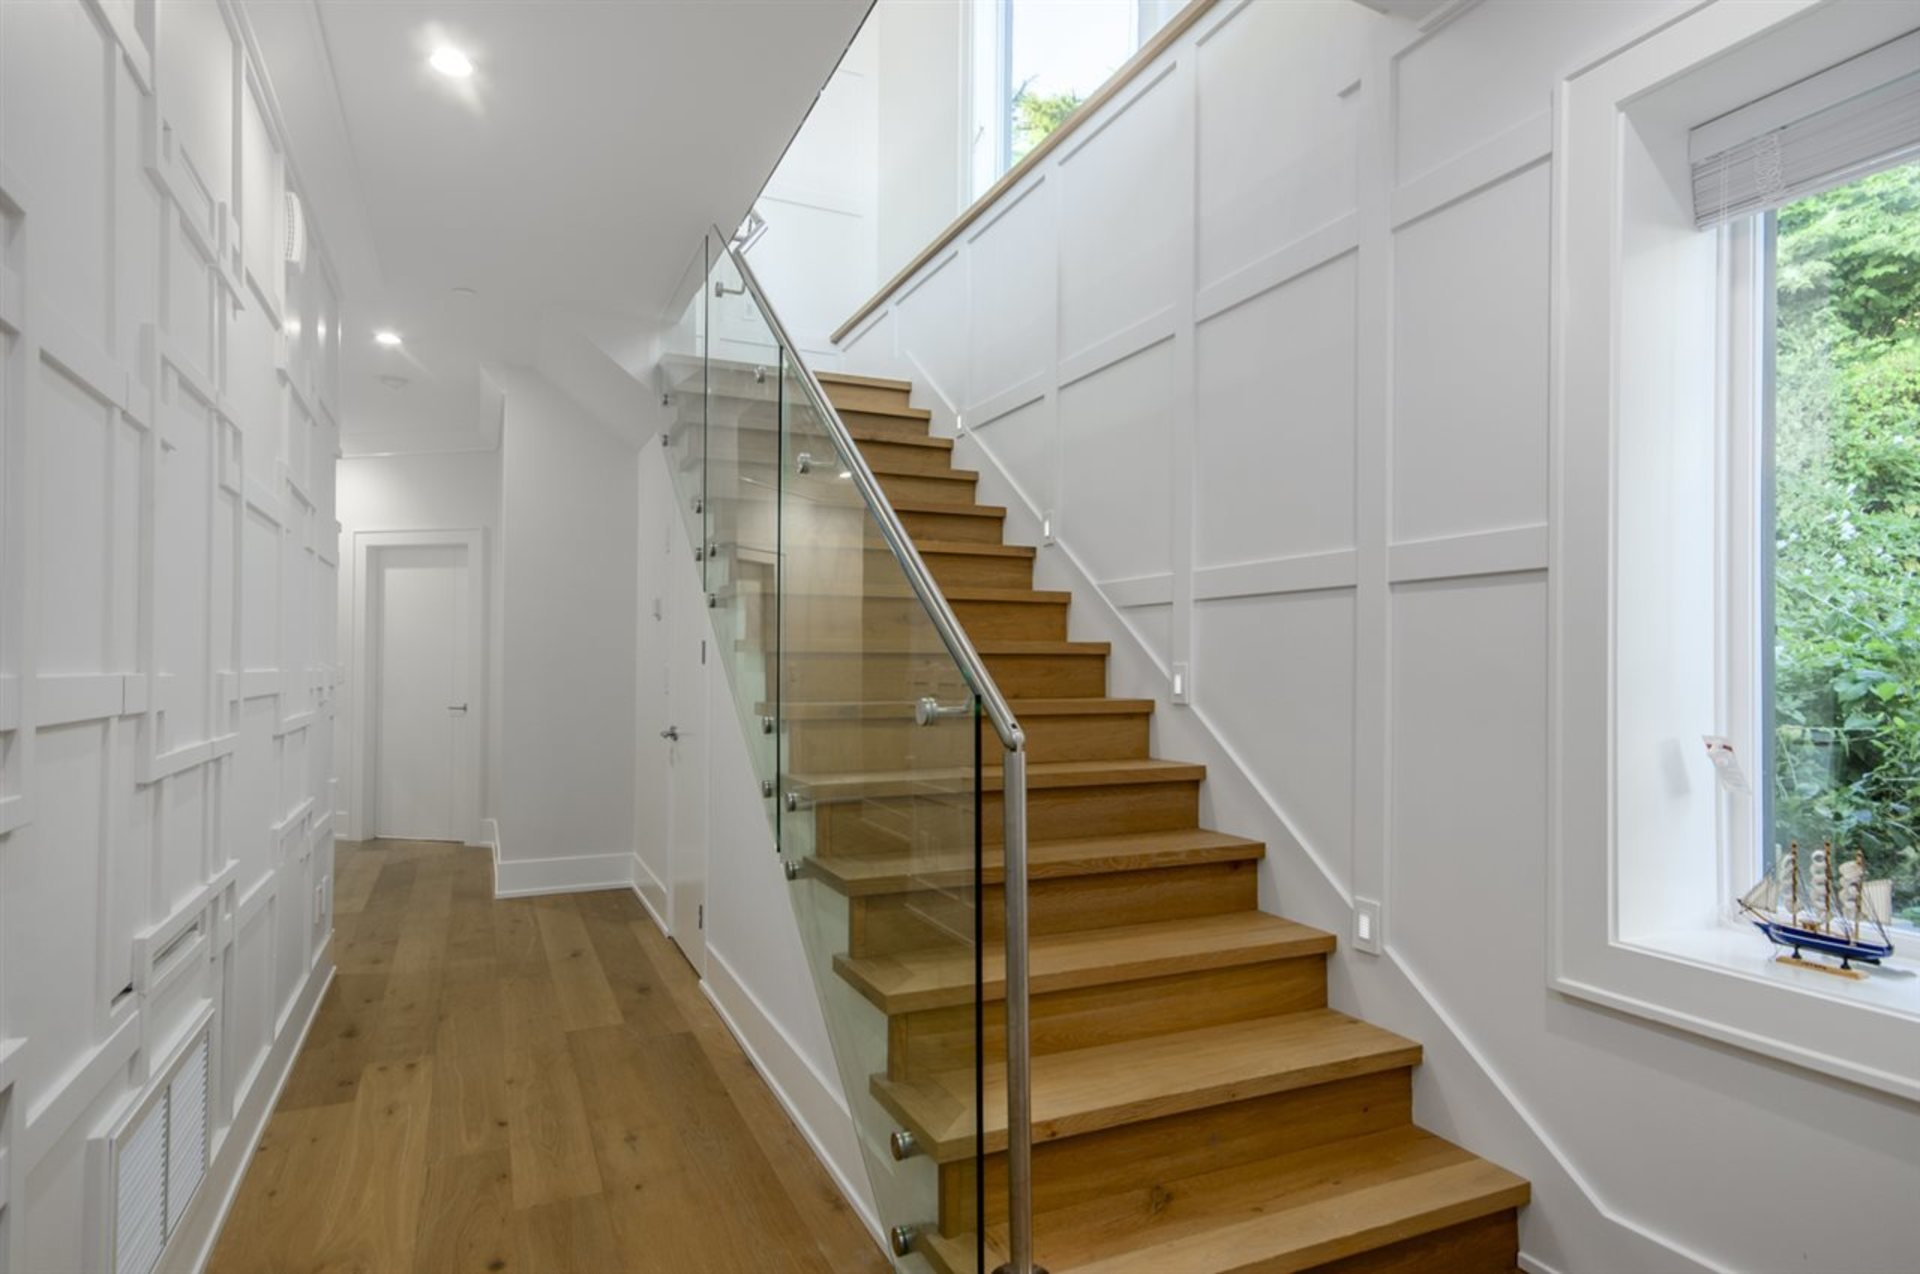 14753-mcdonald-avenue-white-rock-south-surrey-white-rock-26 at 14753 Mcdonald Avenue, White Rock, South Surrey White Rock